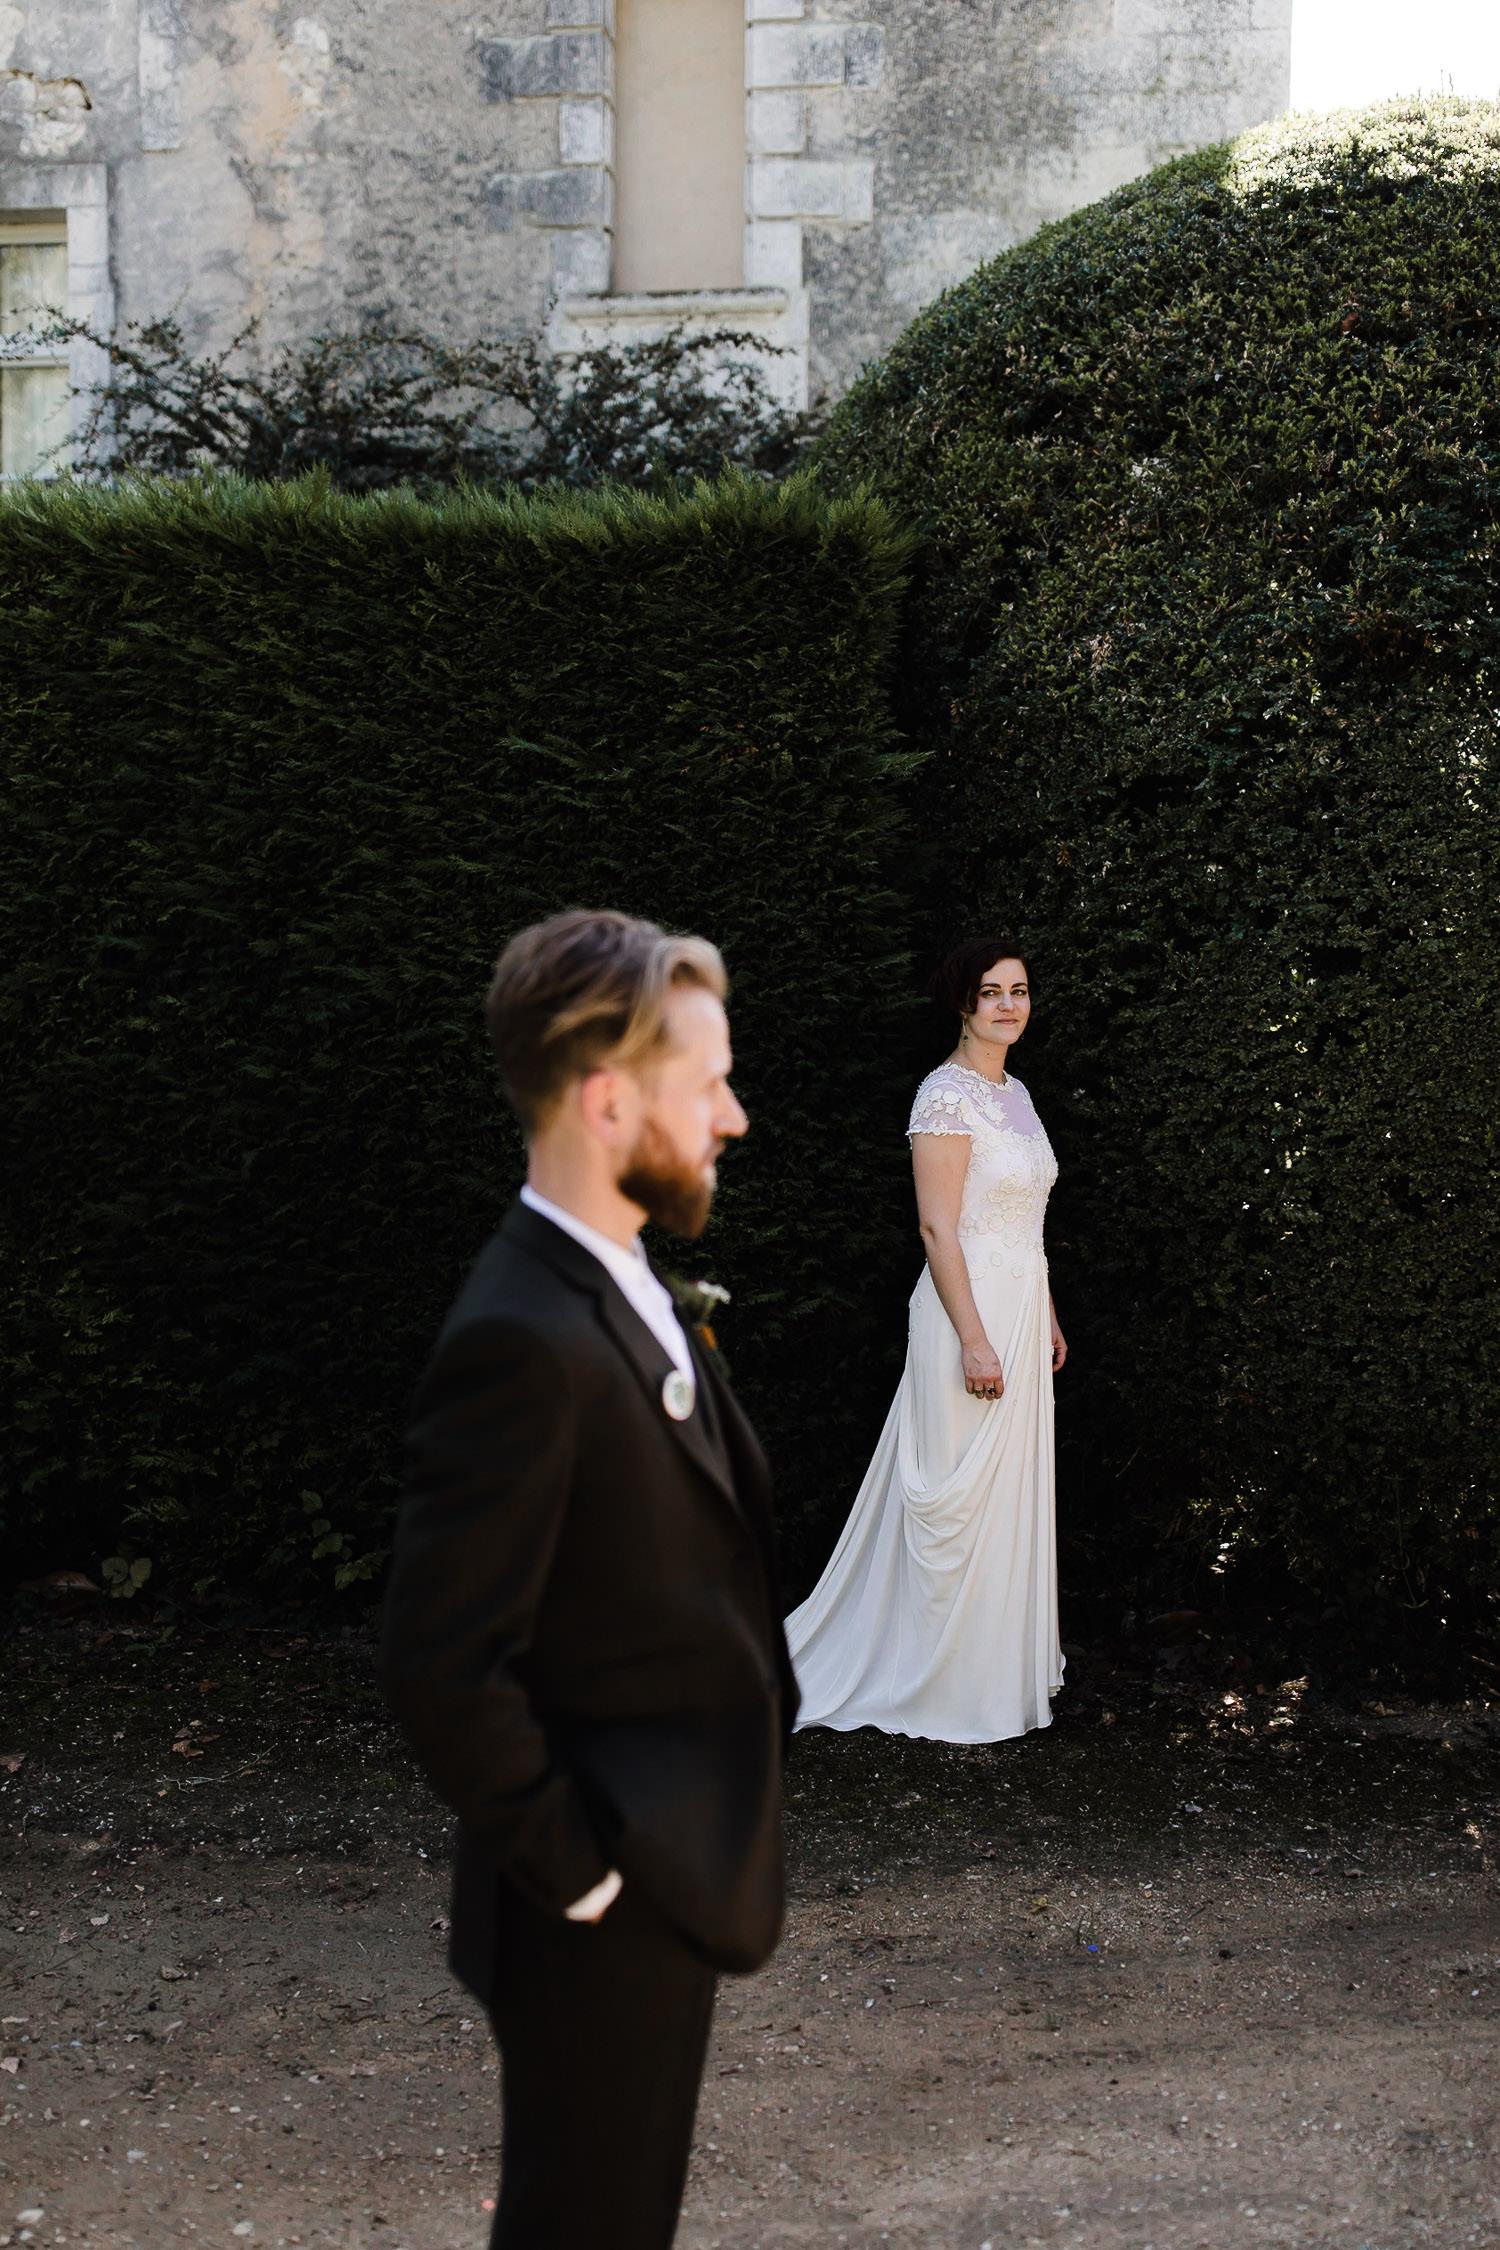 France-Destination-Wedding-Chateau-la-Blérétie-Best-Of-Holly-Jack-71.jpg